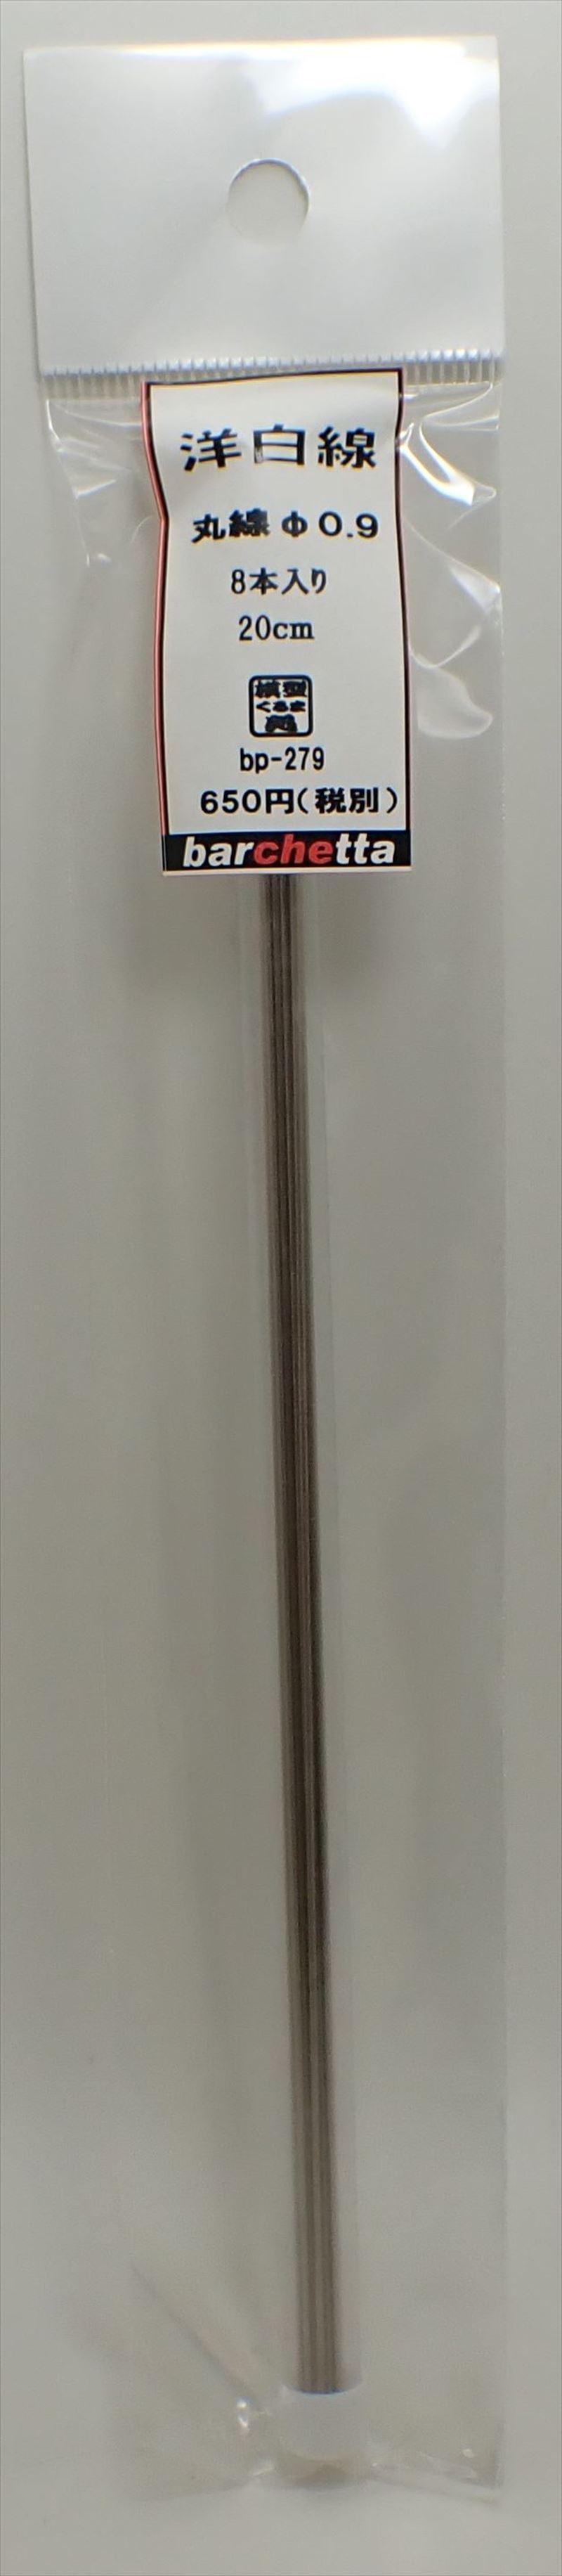 bp279  洋白線 丸棒 φ0.9 8本入り 20cm